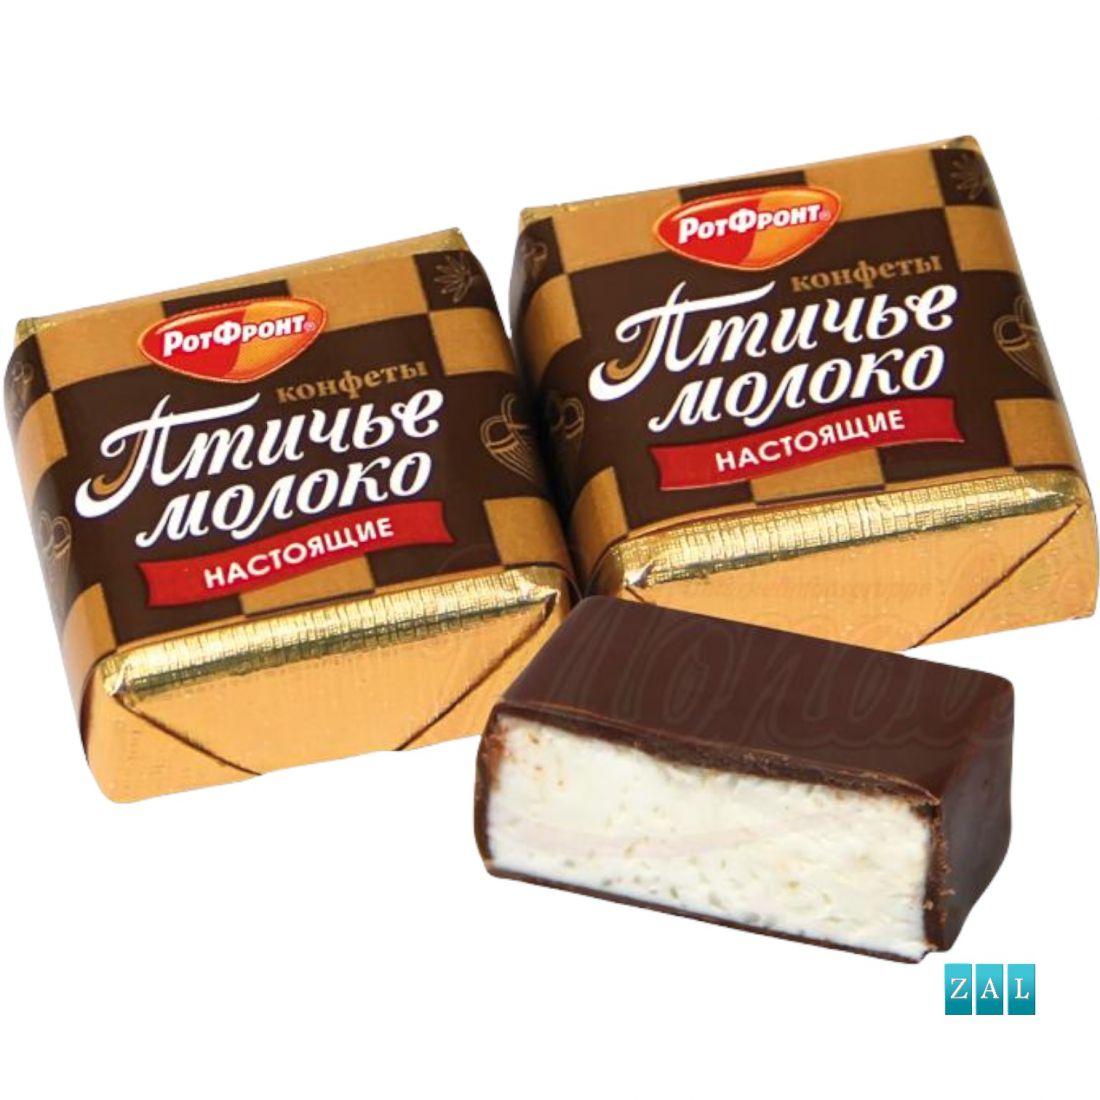 """Madártej"" tejszín ízű habcukor praliné, kakaótartalmú bevonattal 100g"